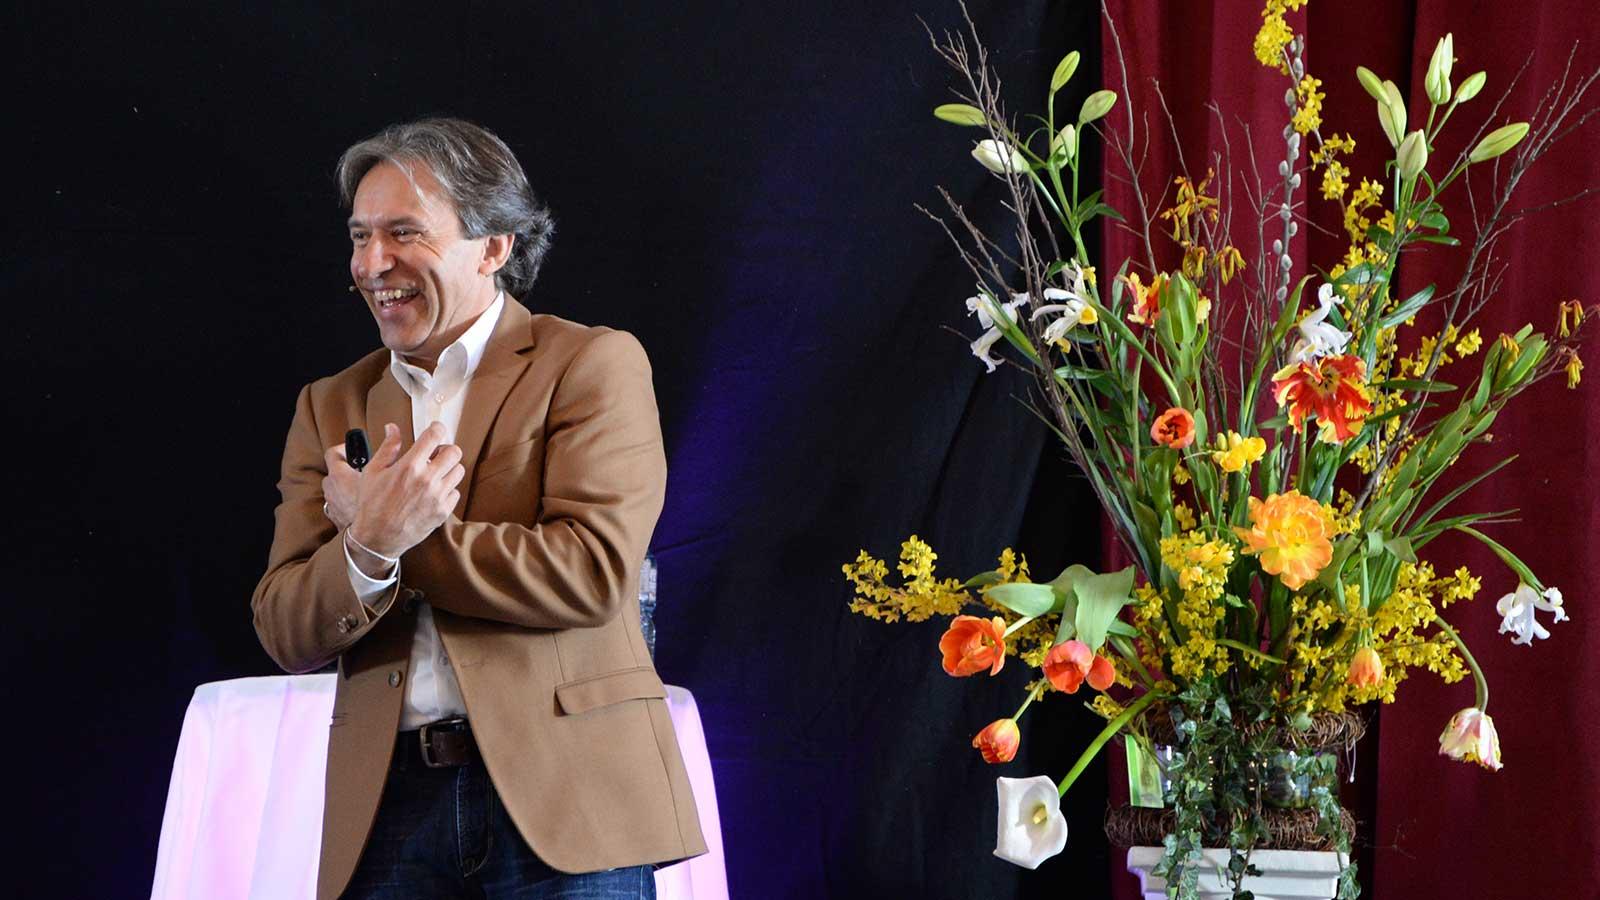 Wendelin Niederberger Keynote-Speaker begeistert sein Publikum